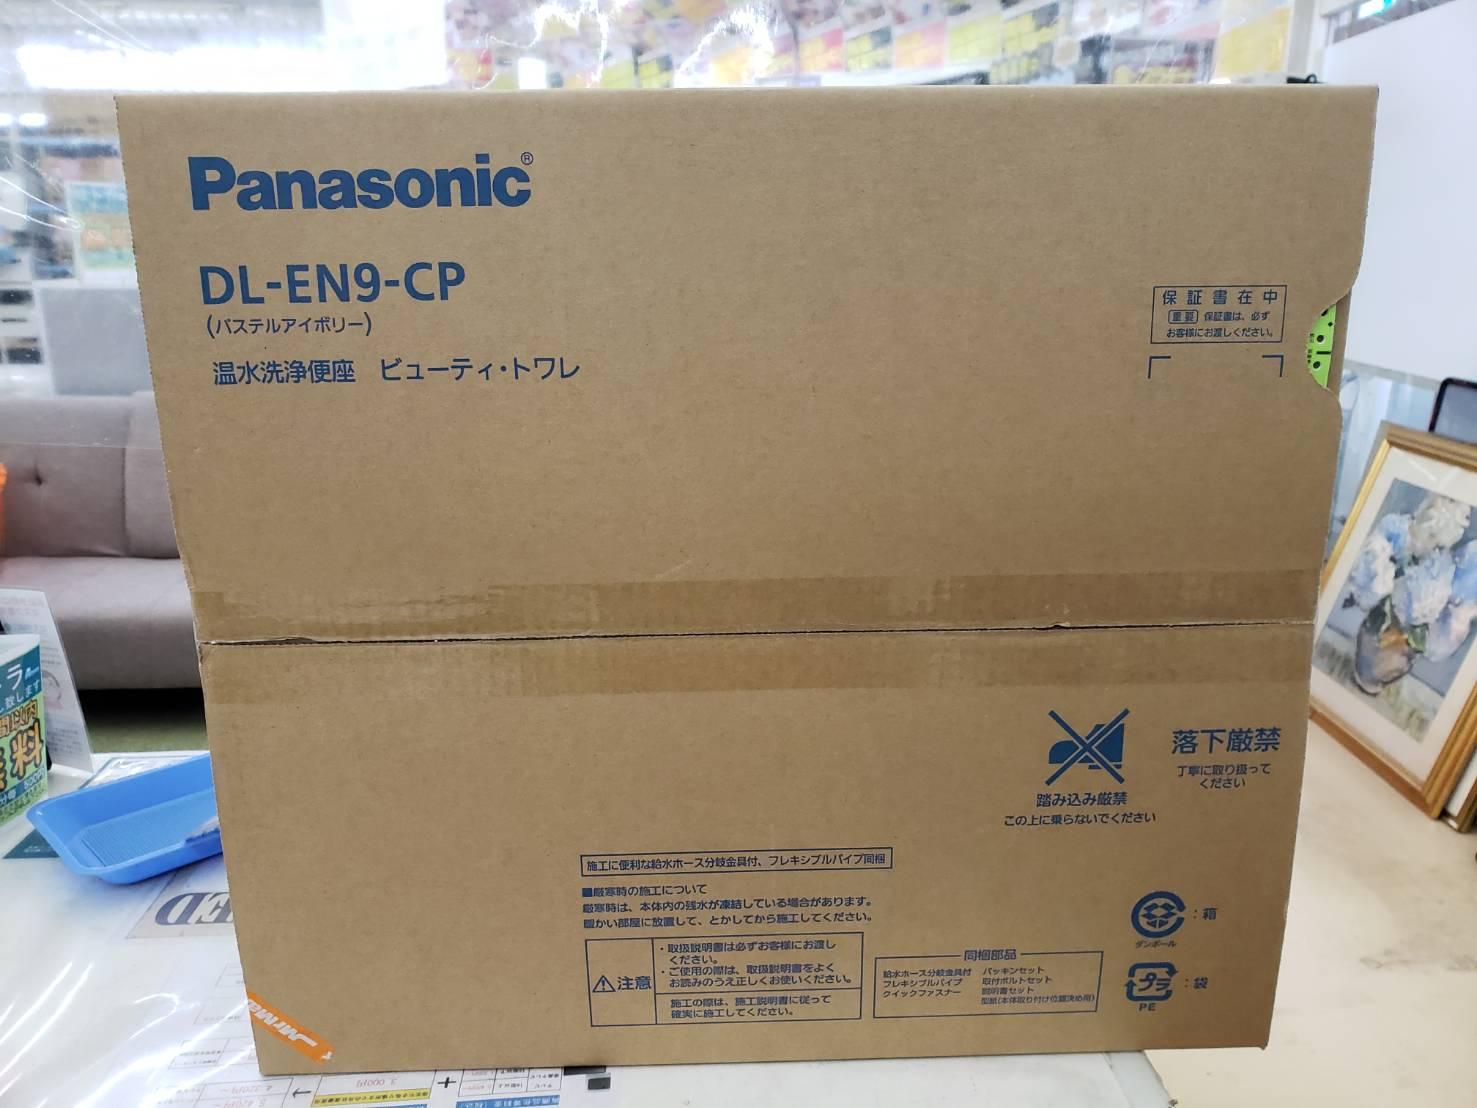 panasonic / パナソニック / 温水洗浄便座 / ビューティートワレ / DL-EN9-CP / 未使用品 買取致しました。の買取-